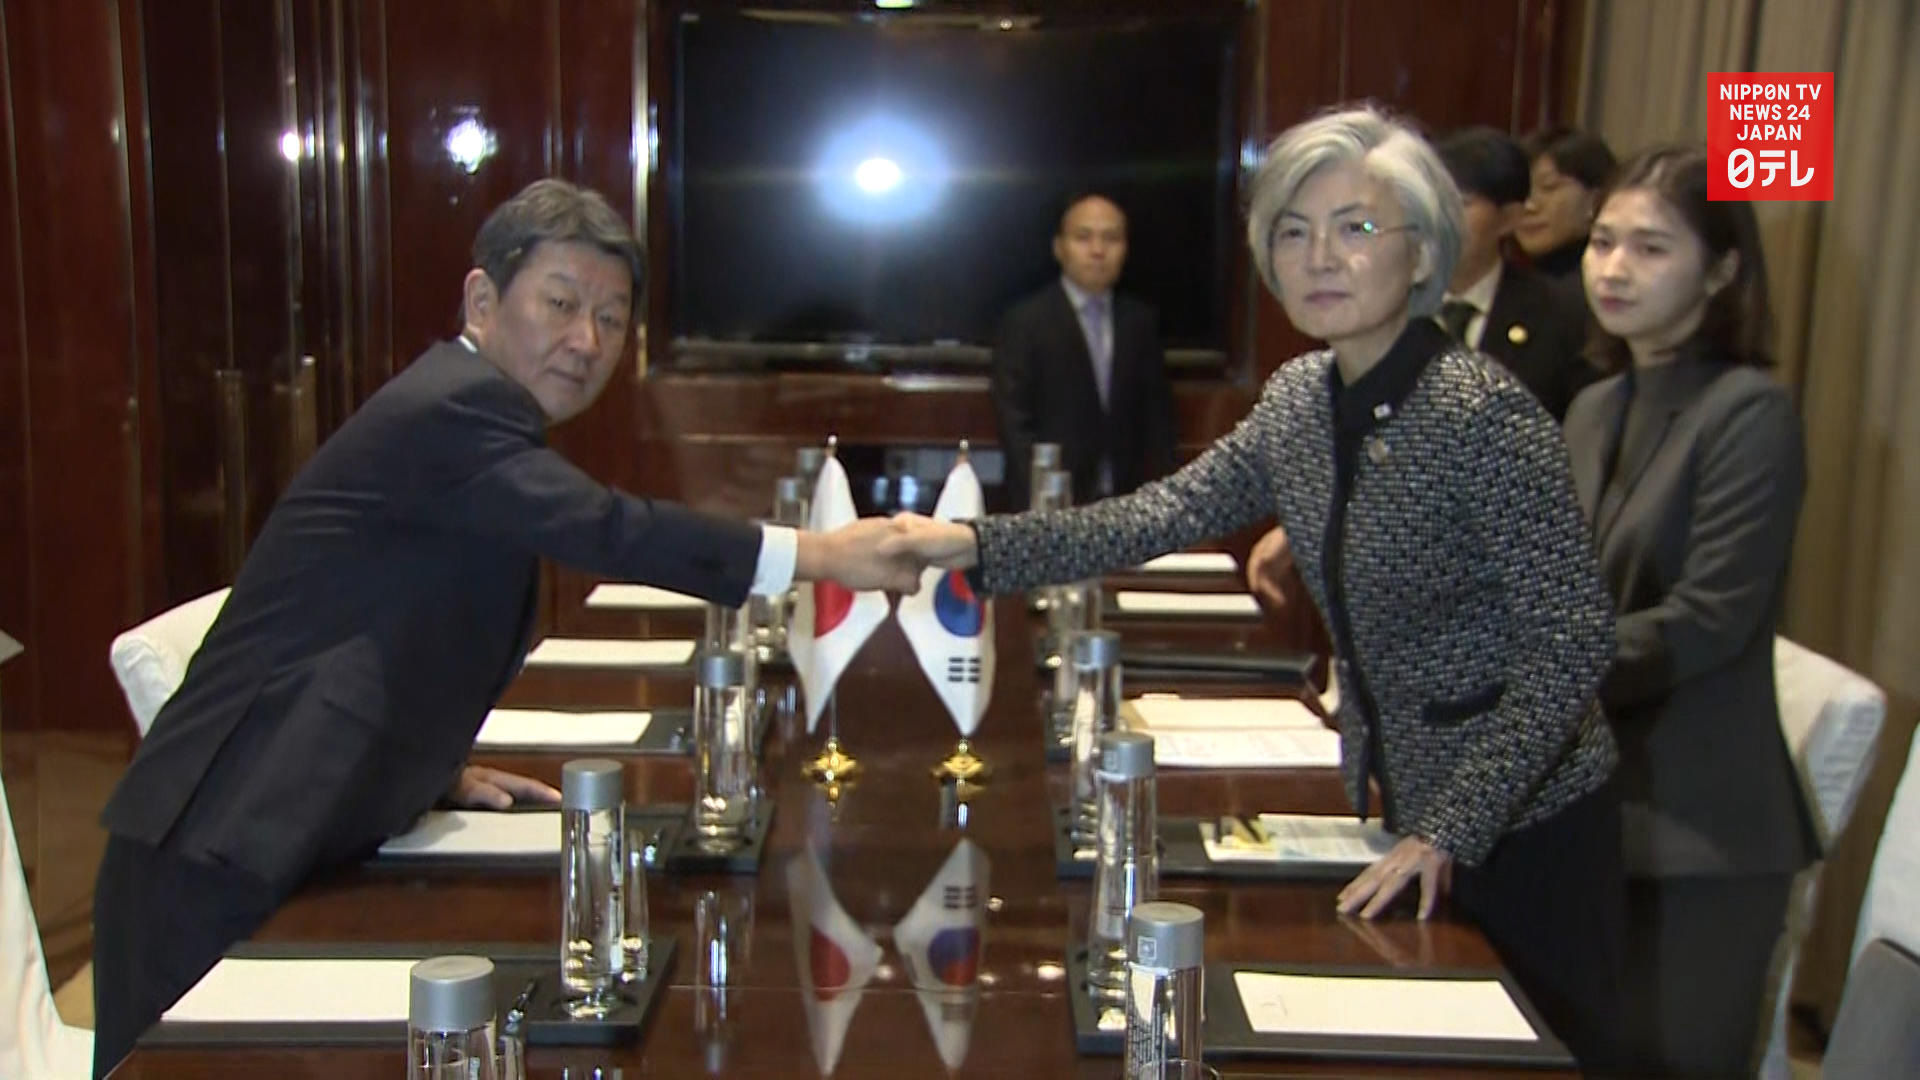 Japan, S. Korea foreign ministers meet ahead of summit